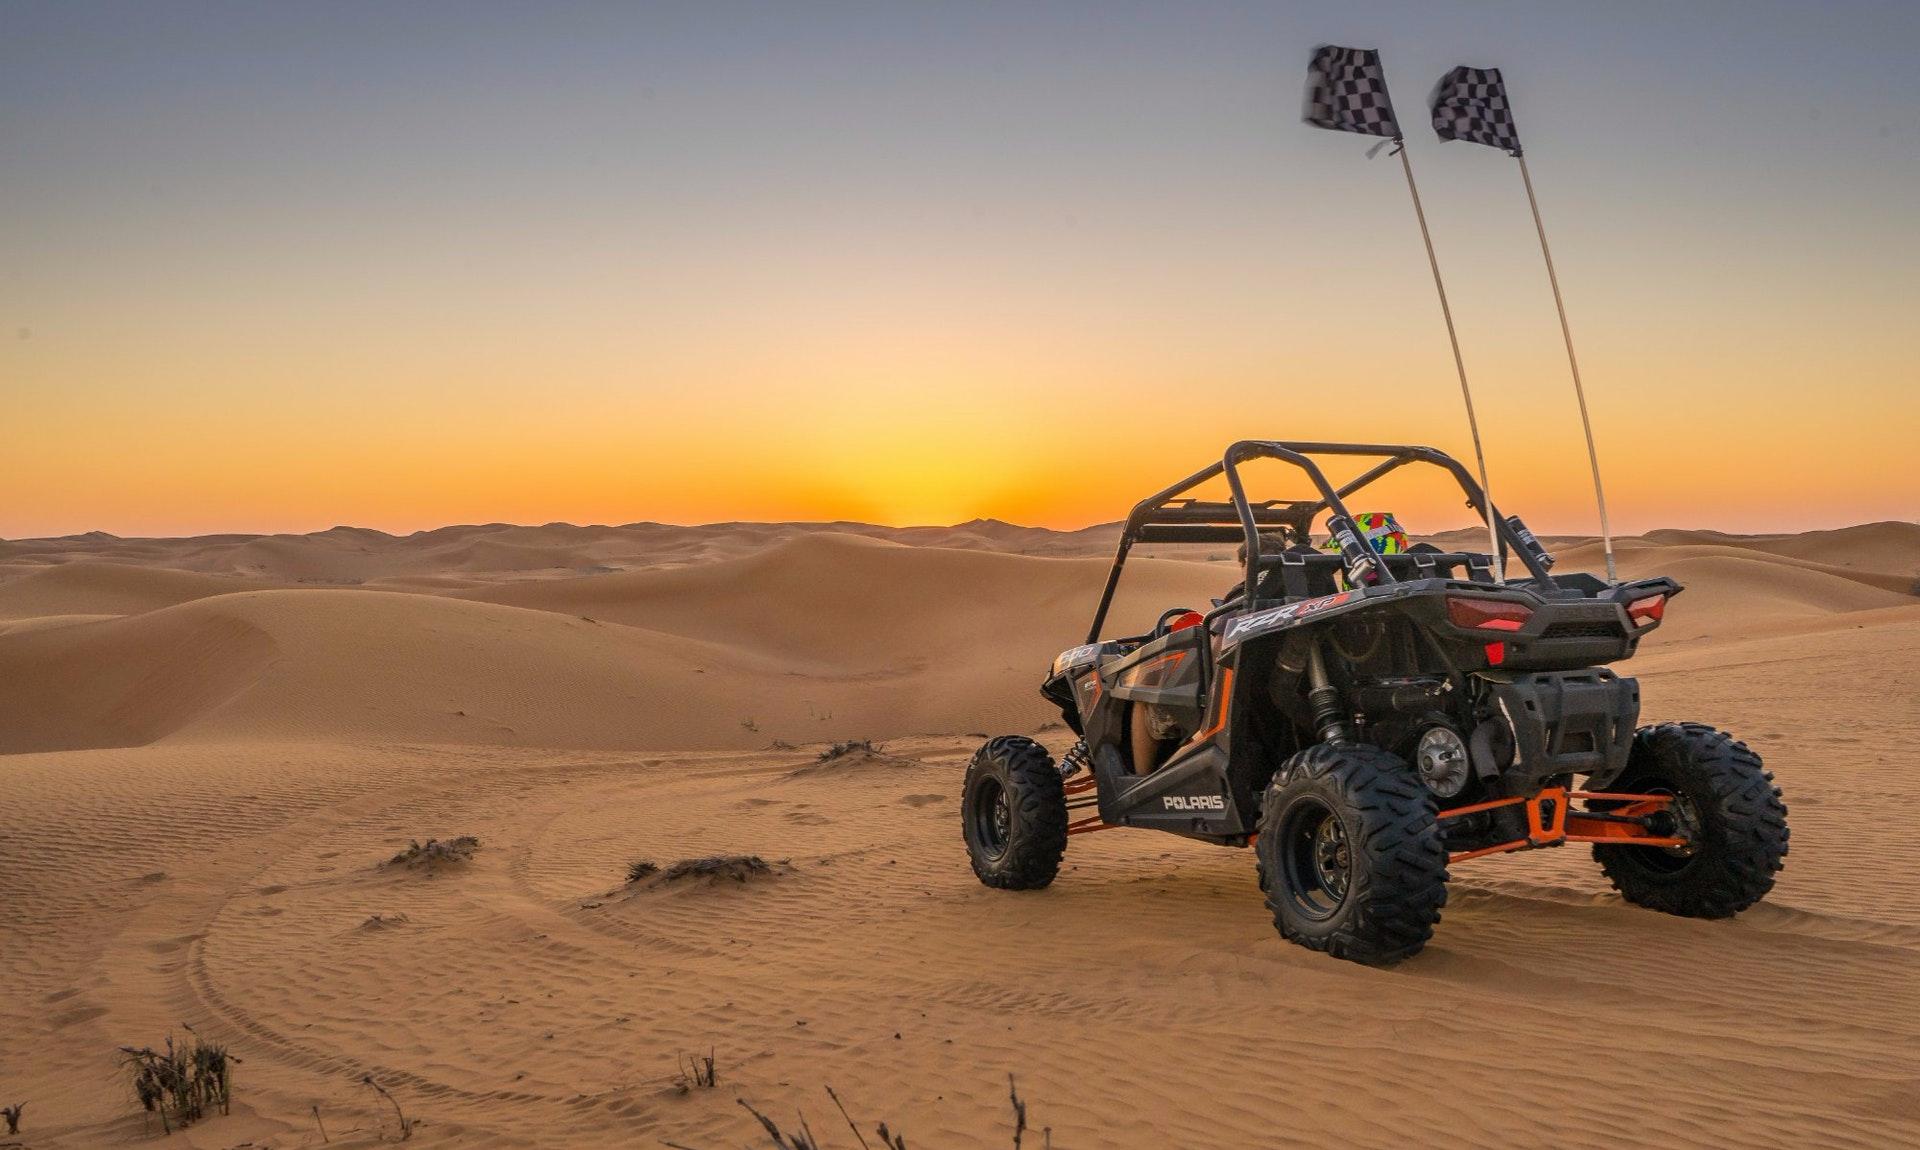 15fea8e1-f189-49a6-b4cb-94f806b3a7f5-4948-dubai-morning-dune-buggy-safari-01.jpg